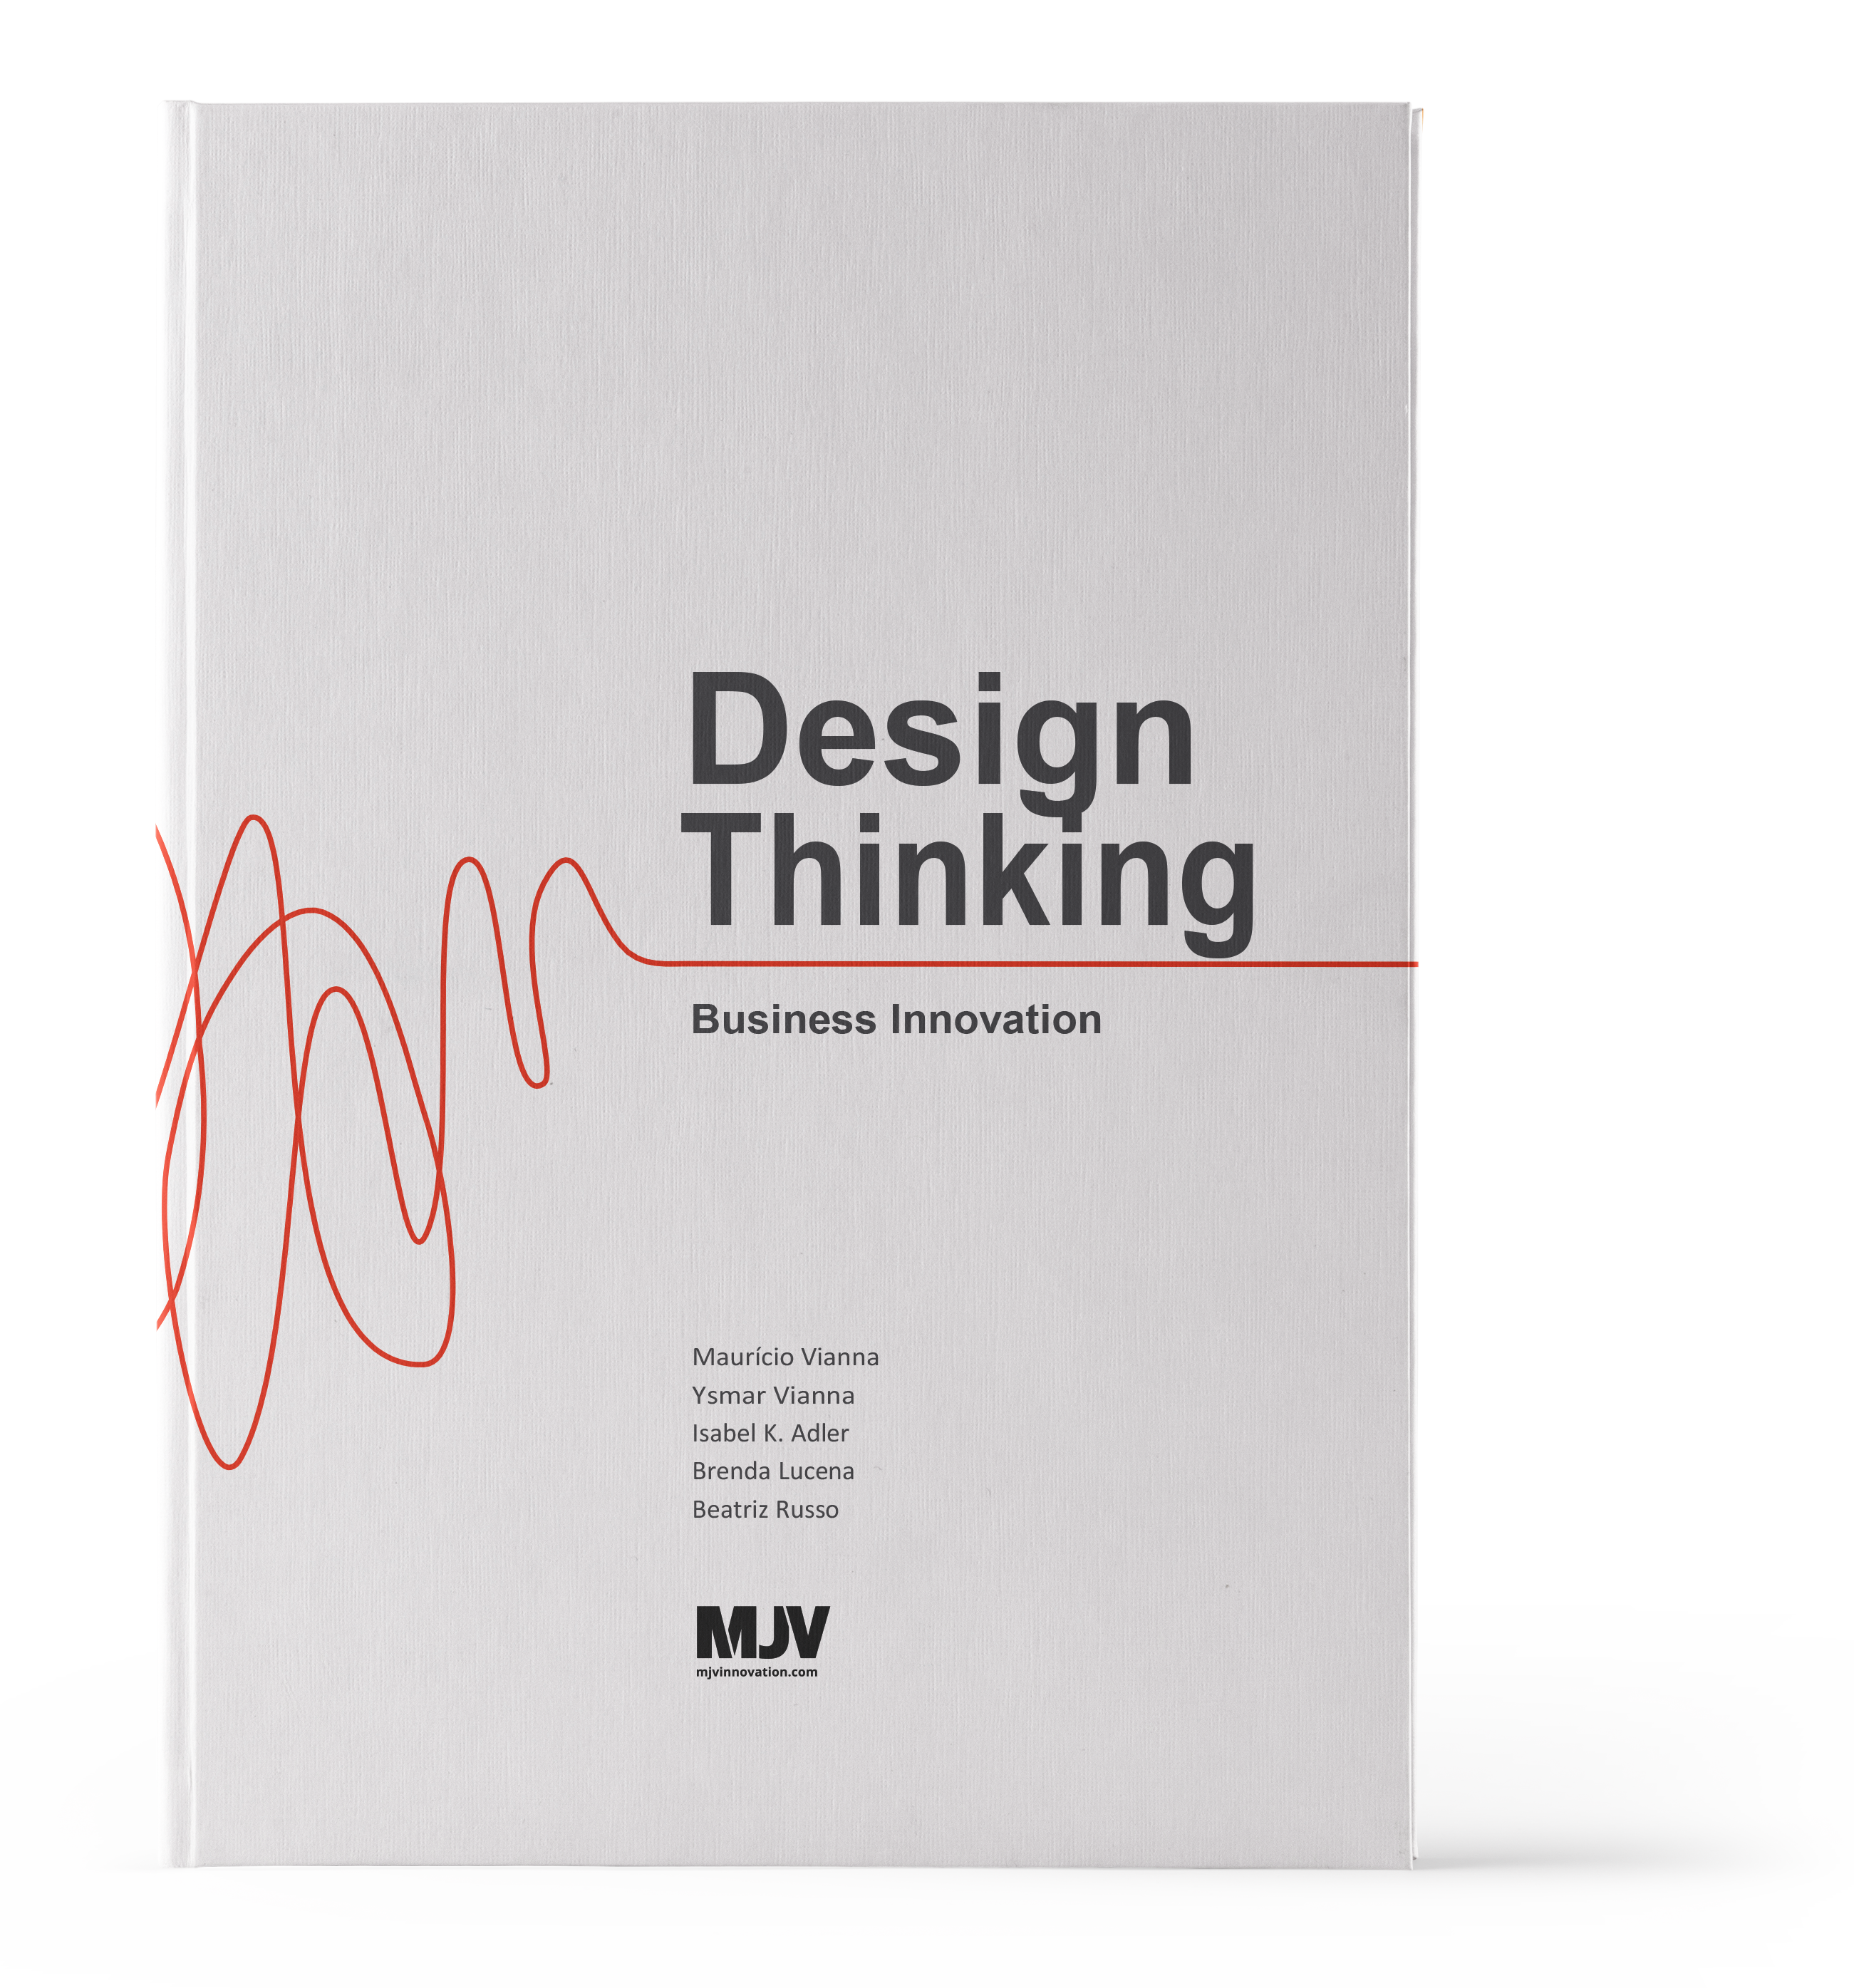 livro_design_thinking_ita